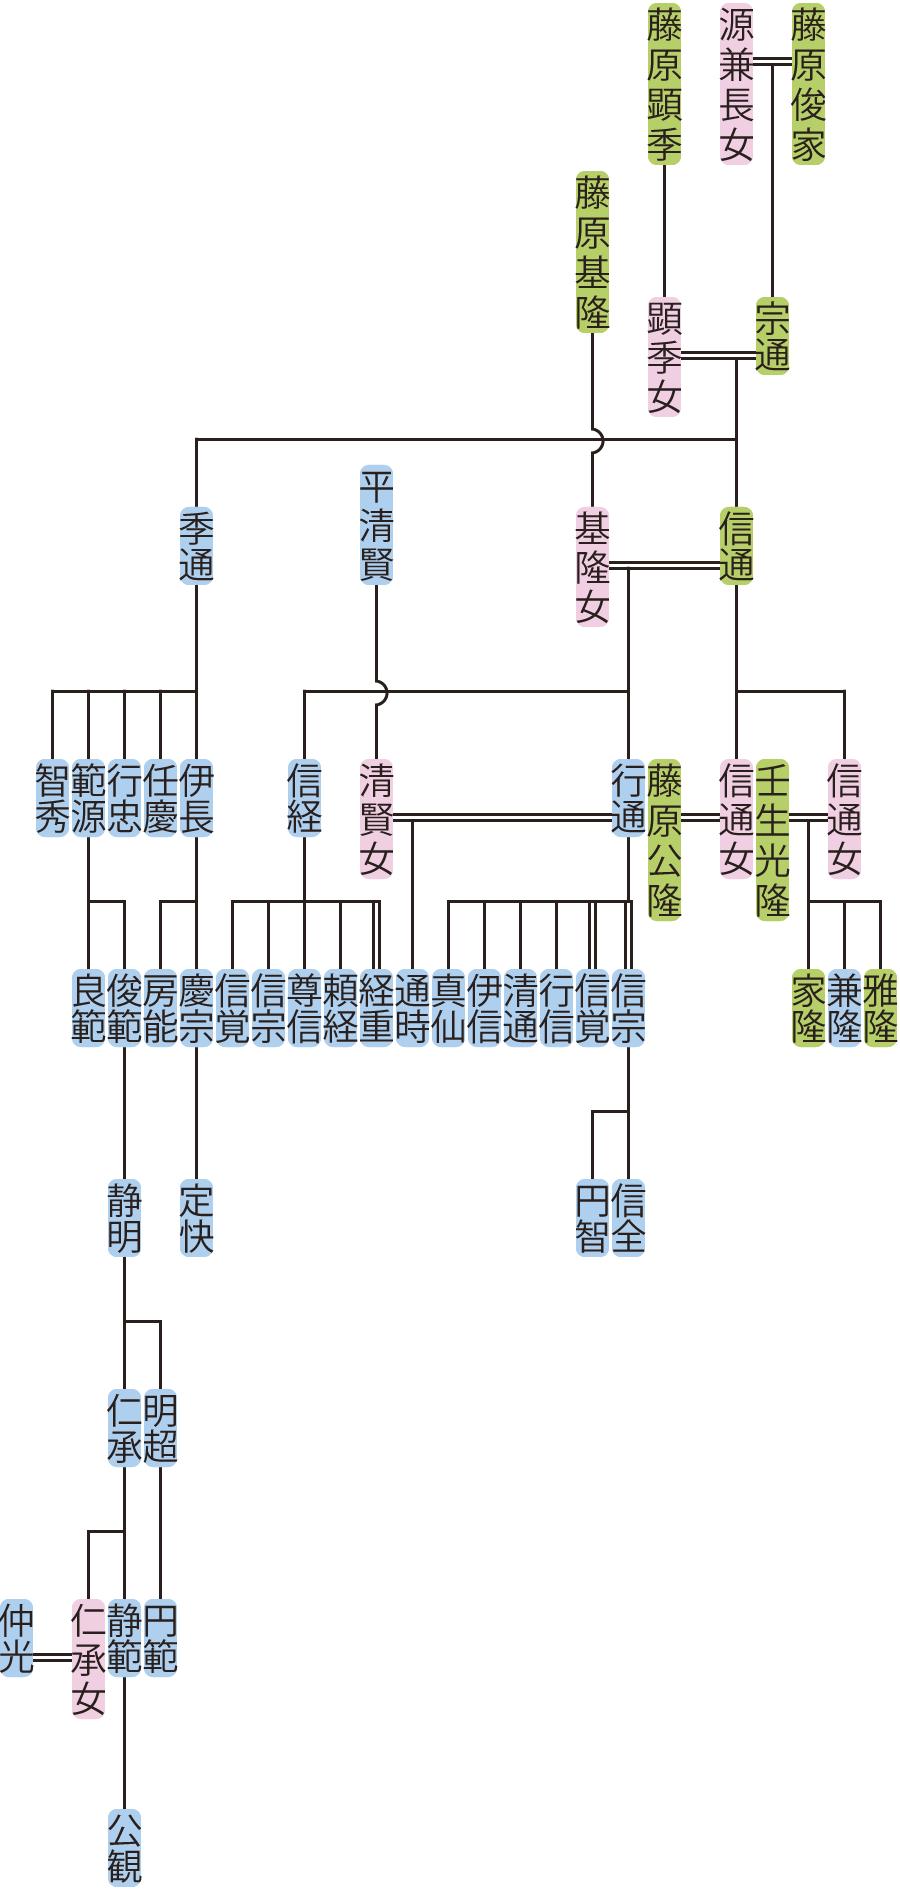 藤原信通・季通の系図